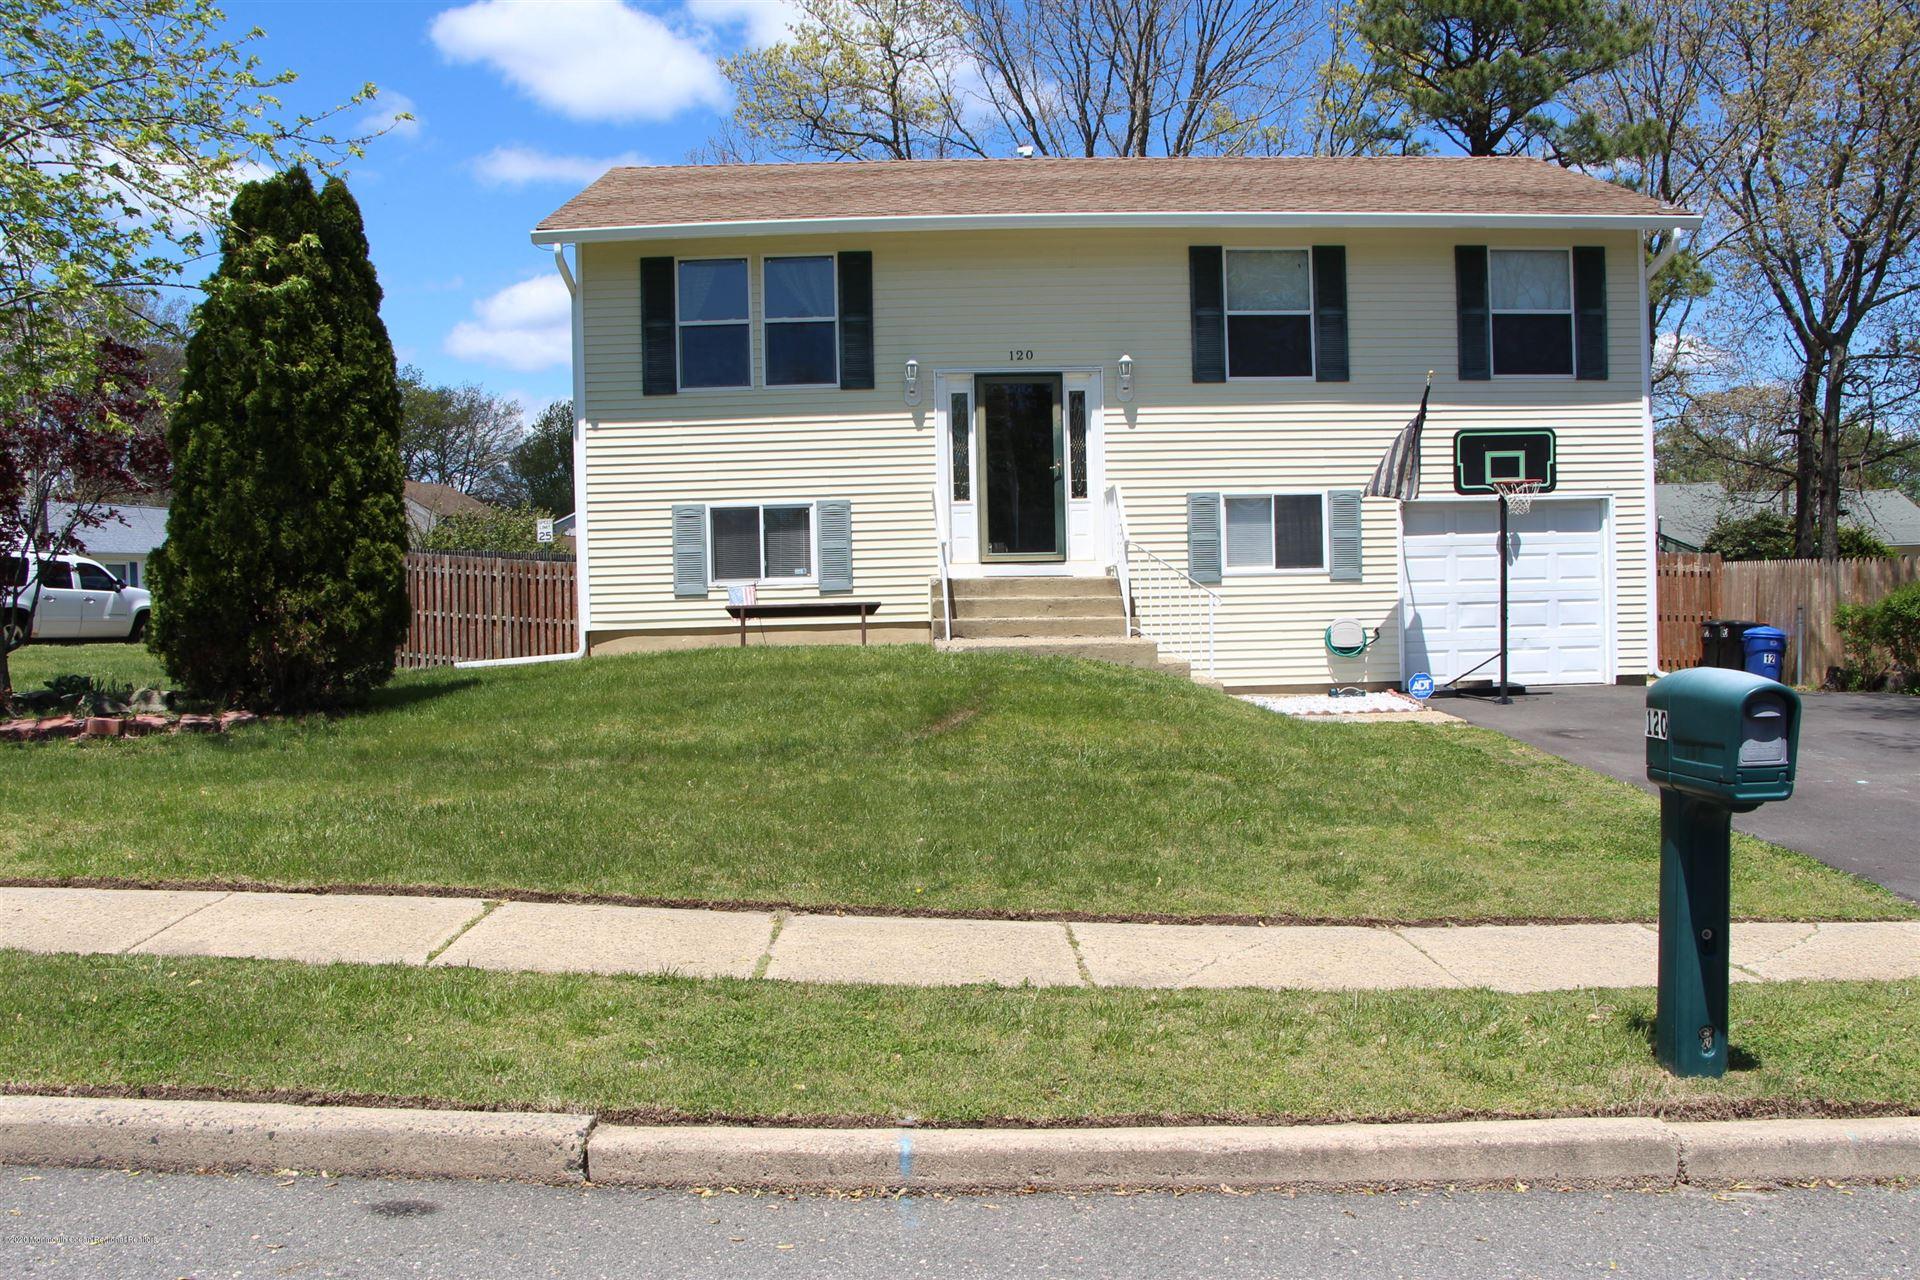 120 Village Drive, Barnegat, NJ 08005 - #: 22015147